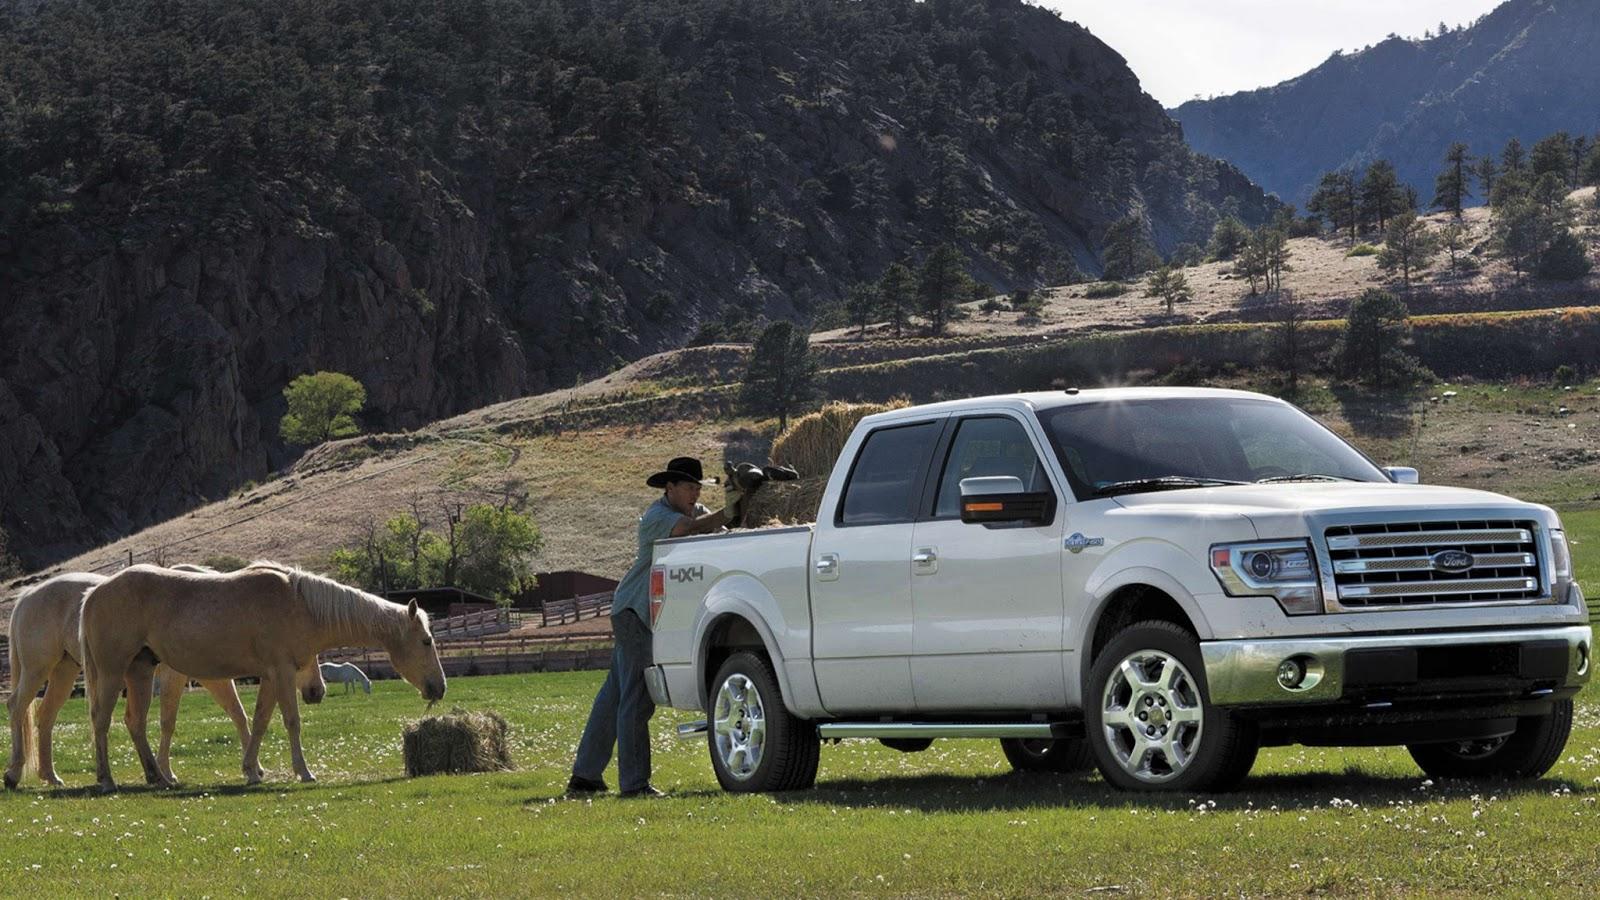 47 080 2013 Ford F 150 King Ranch 5 0 V8 360 Hp Carwp